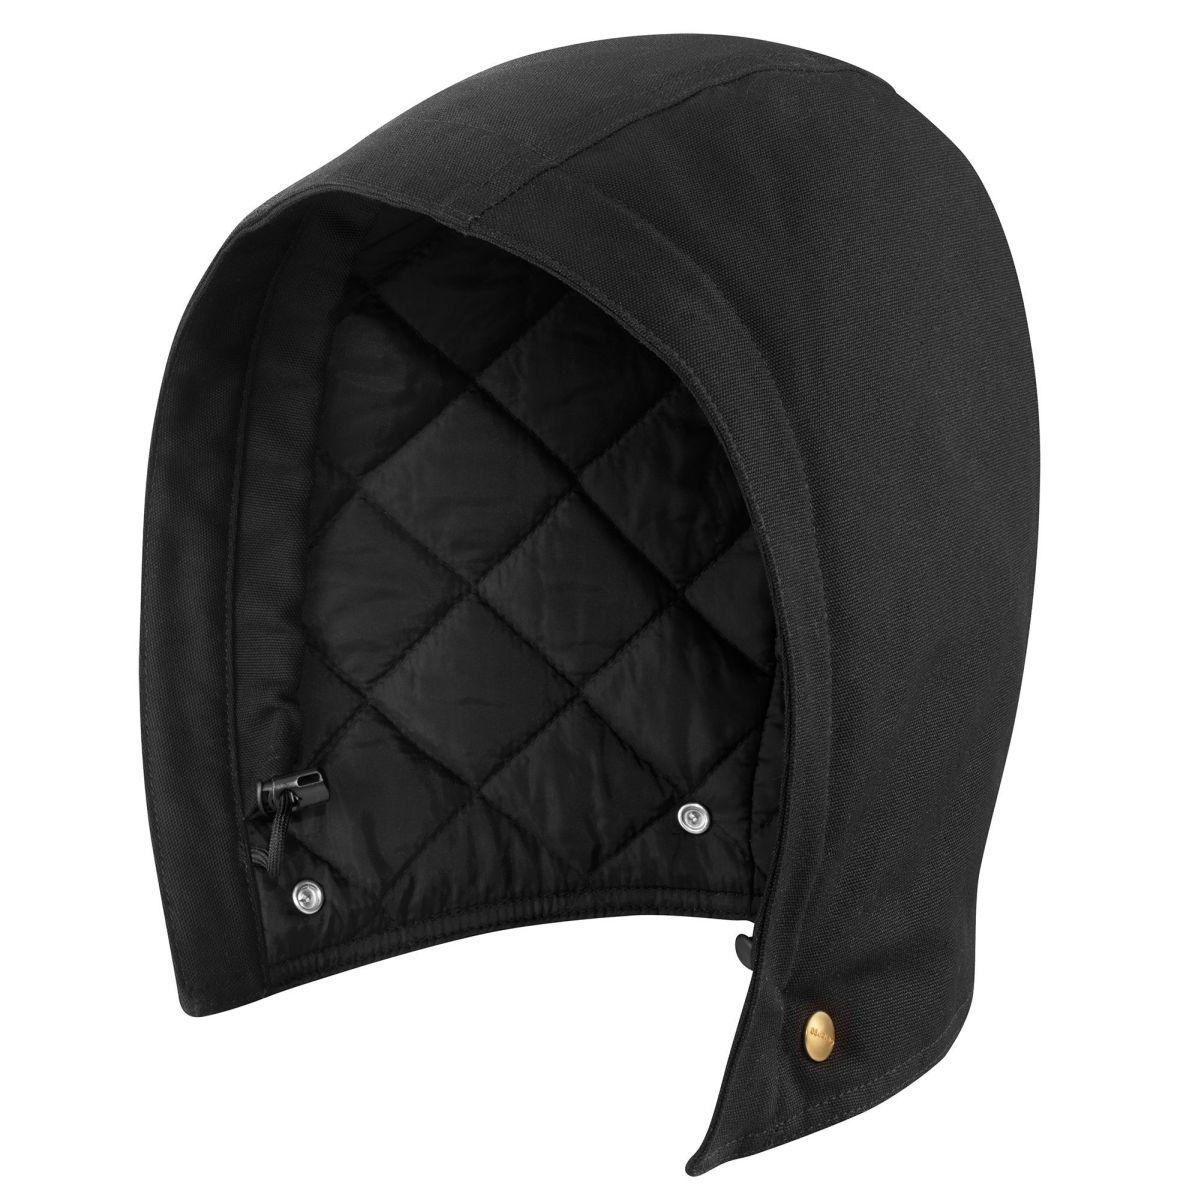 75e0be96566 Buy Mens Quilt Lined Sandstone Hood - Carhartt Online at Best price - WV